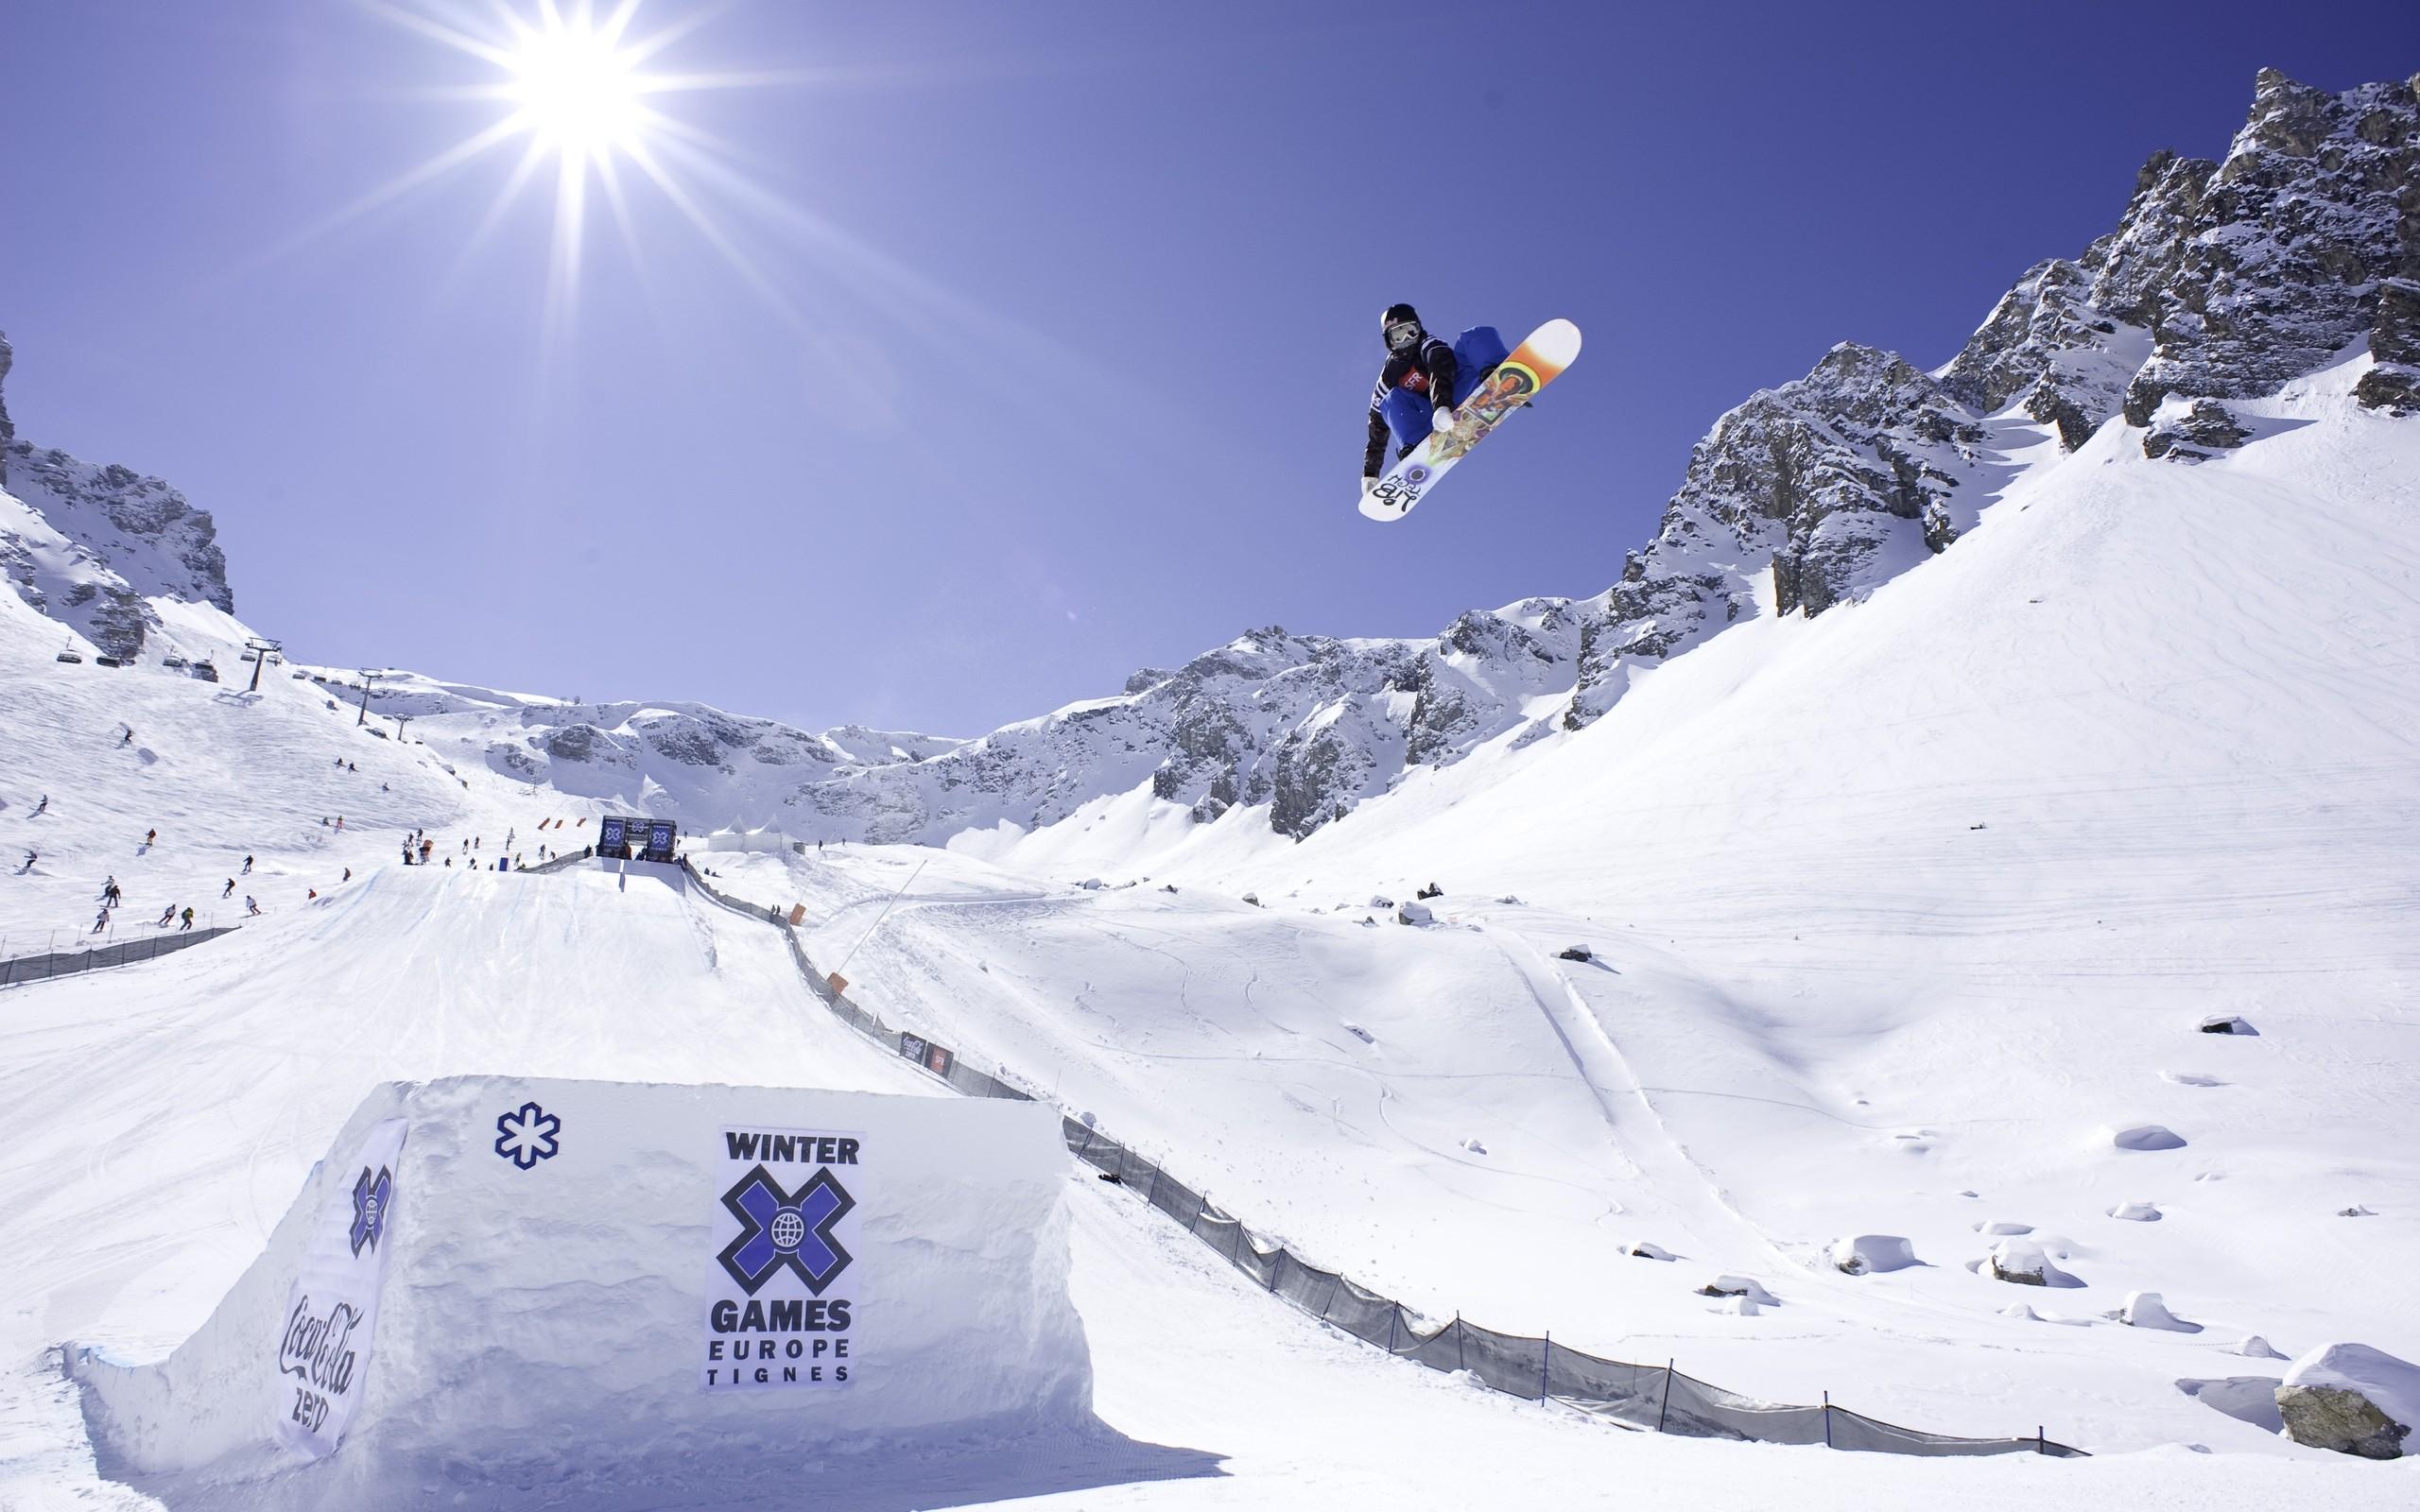 Snowboarding HD Wallpaper Background Image 2560x1600 ID 2560x1600